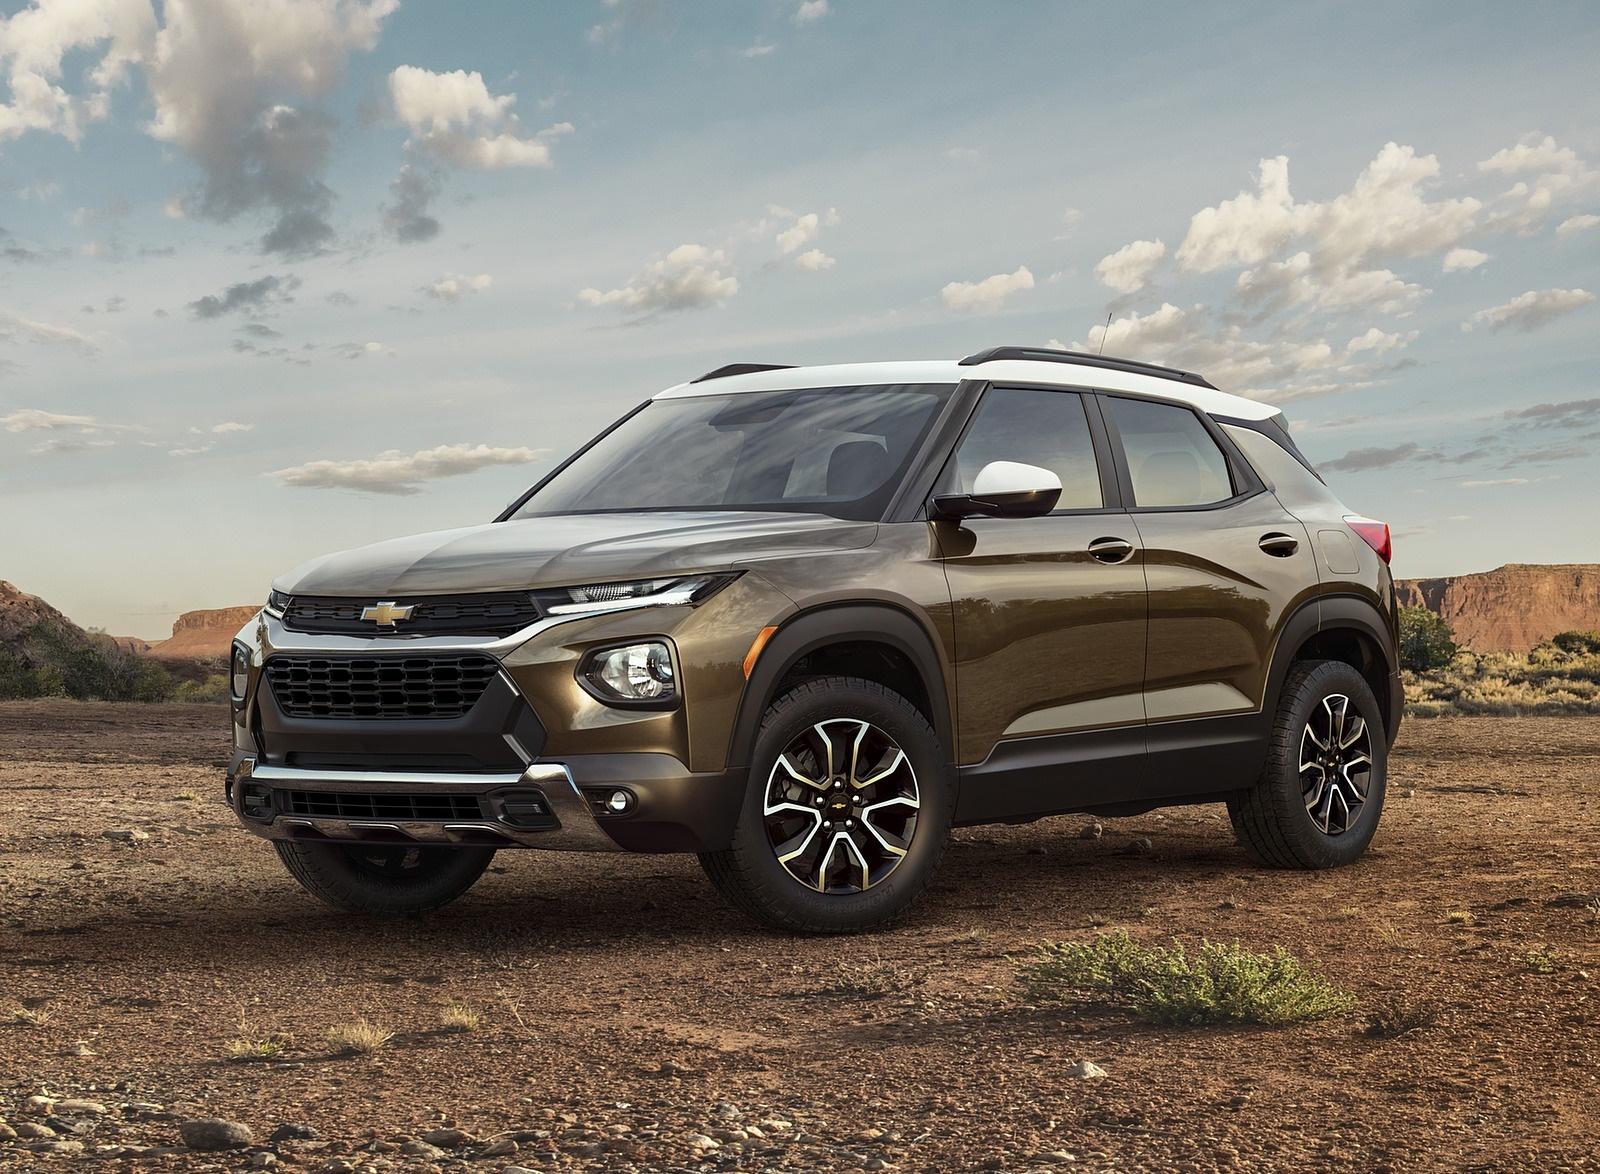 2021 Chevrolet Trailblazer ACTIV Front Three-Quarter Wallpapers (6)